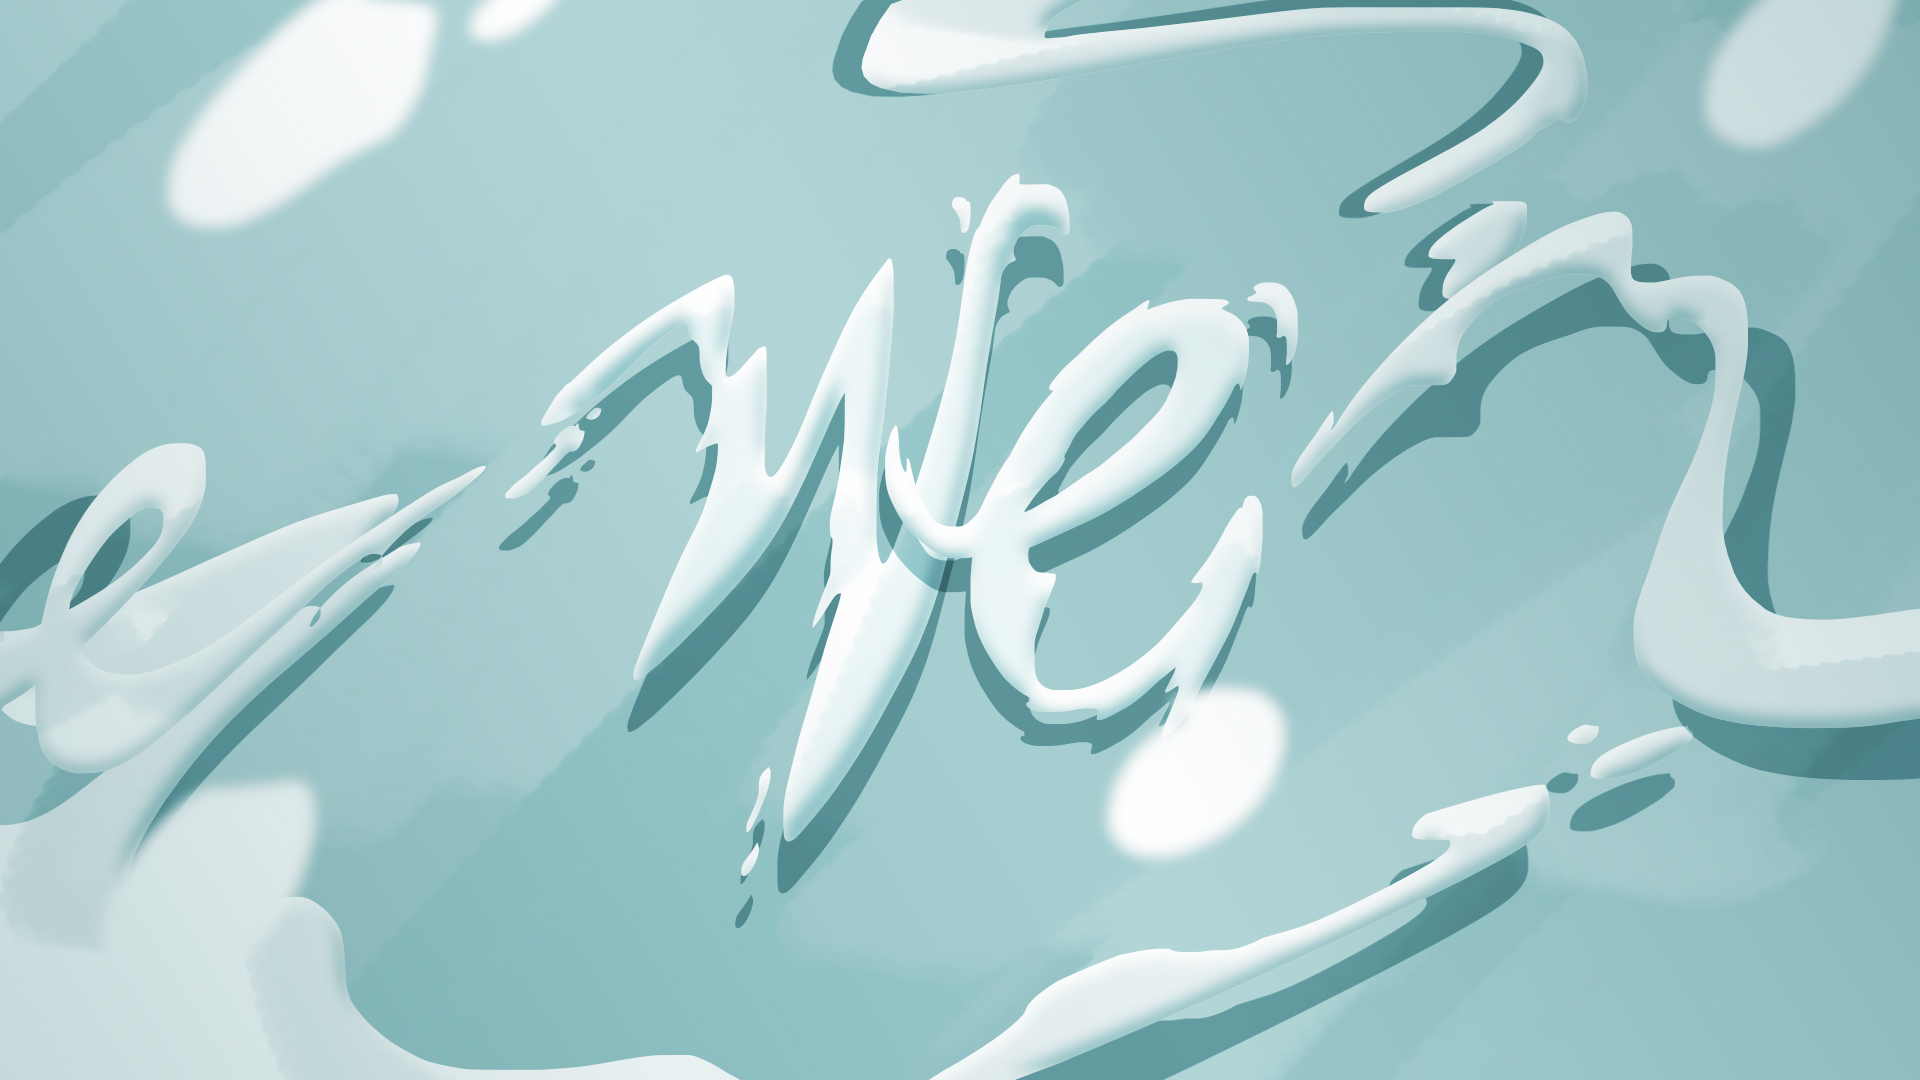 WS_illustrative_01.jpg